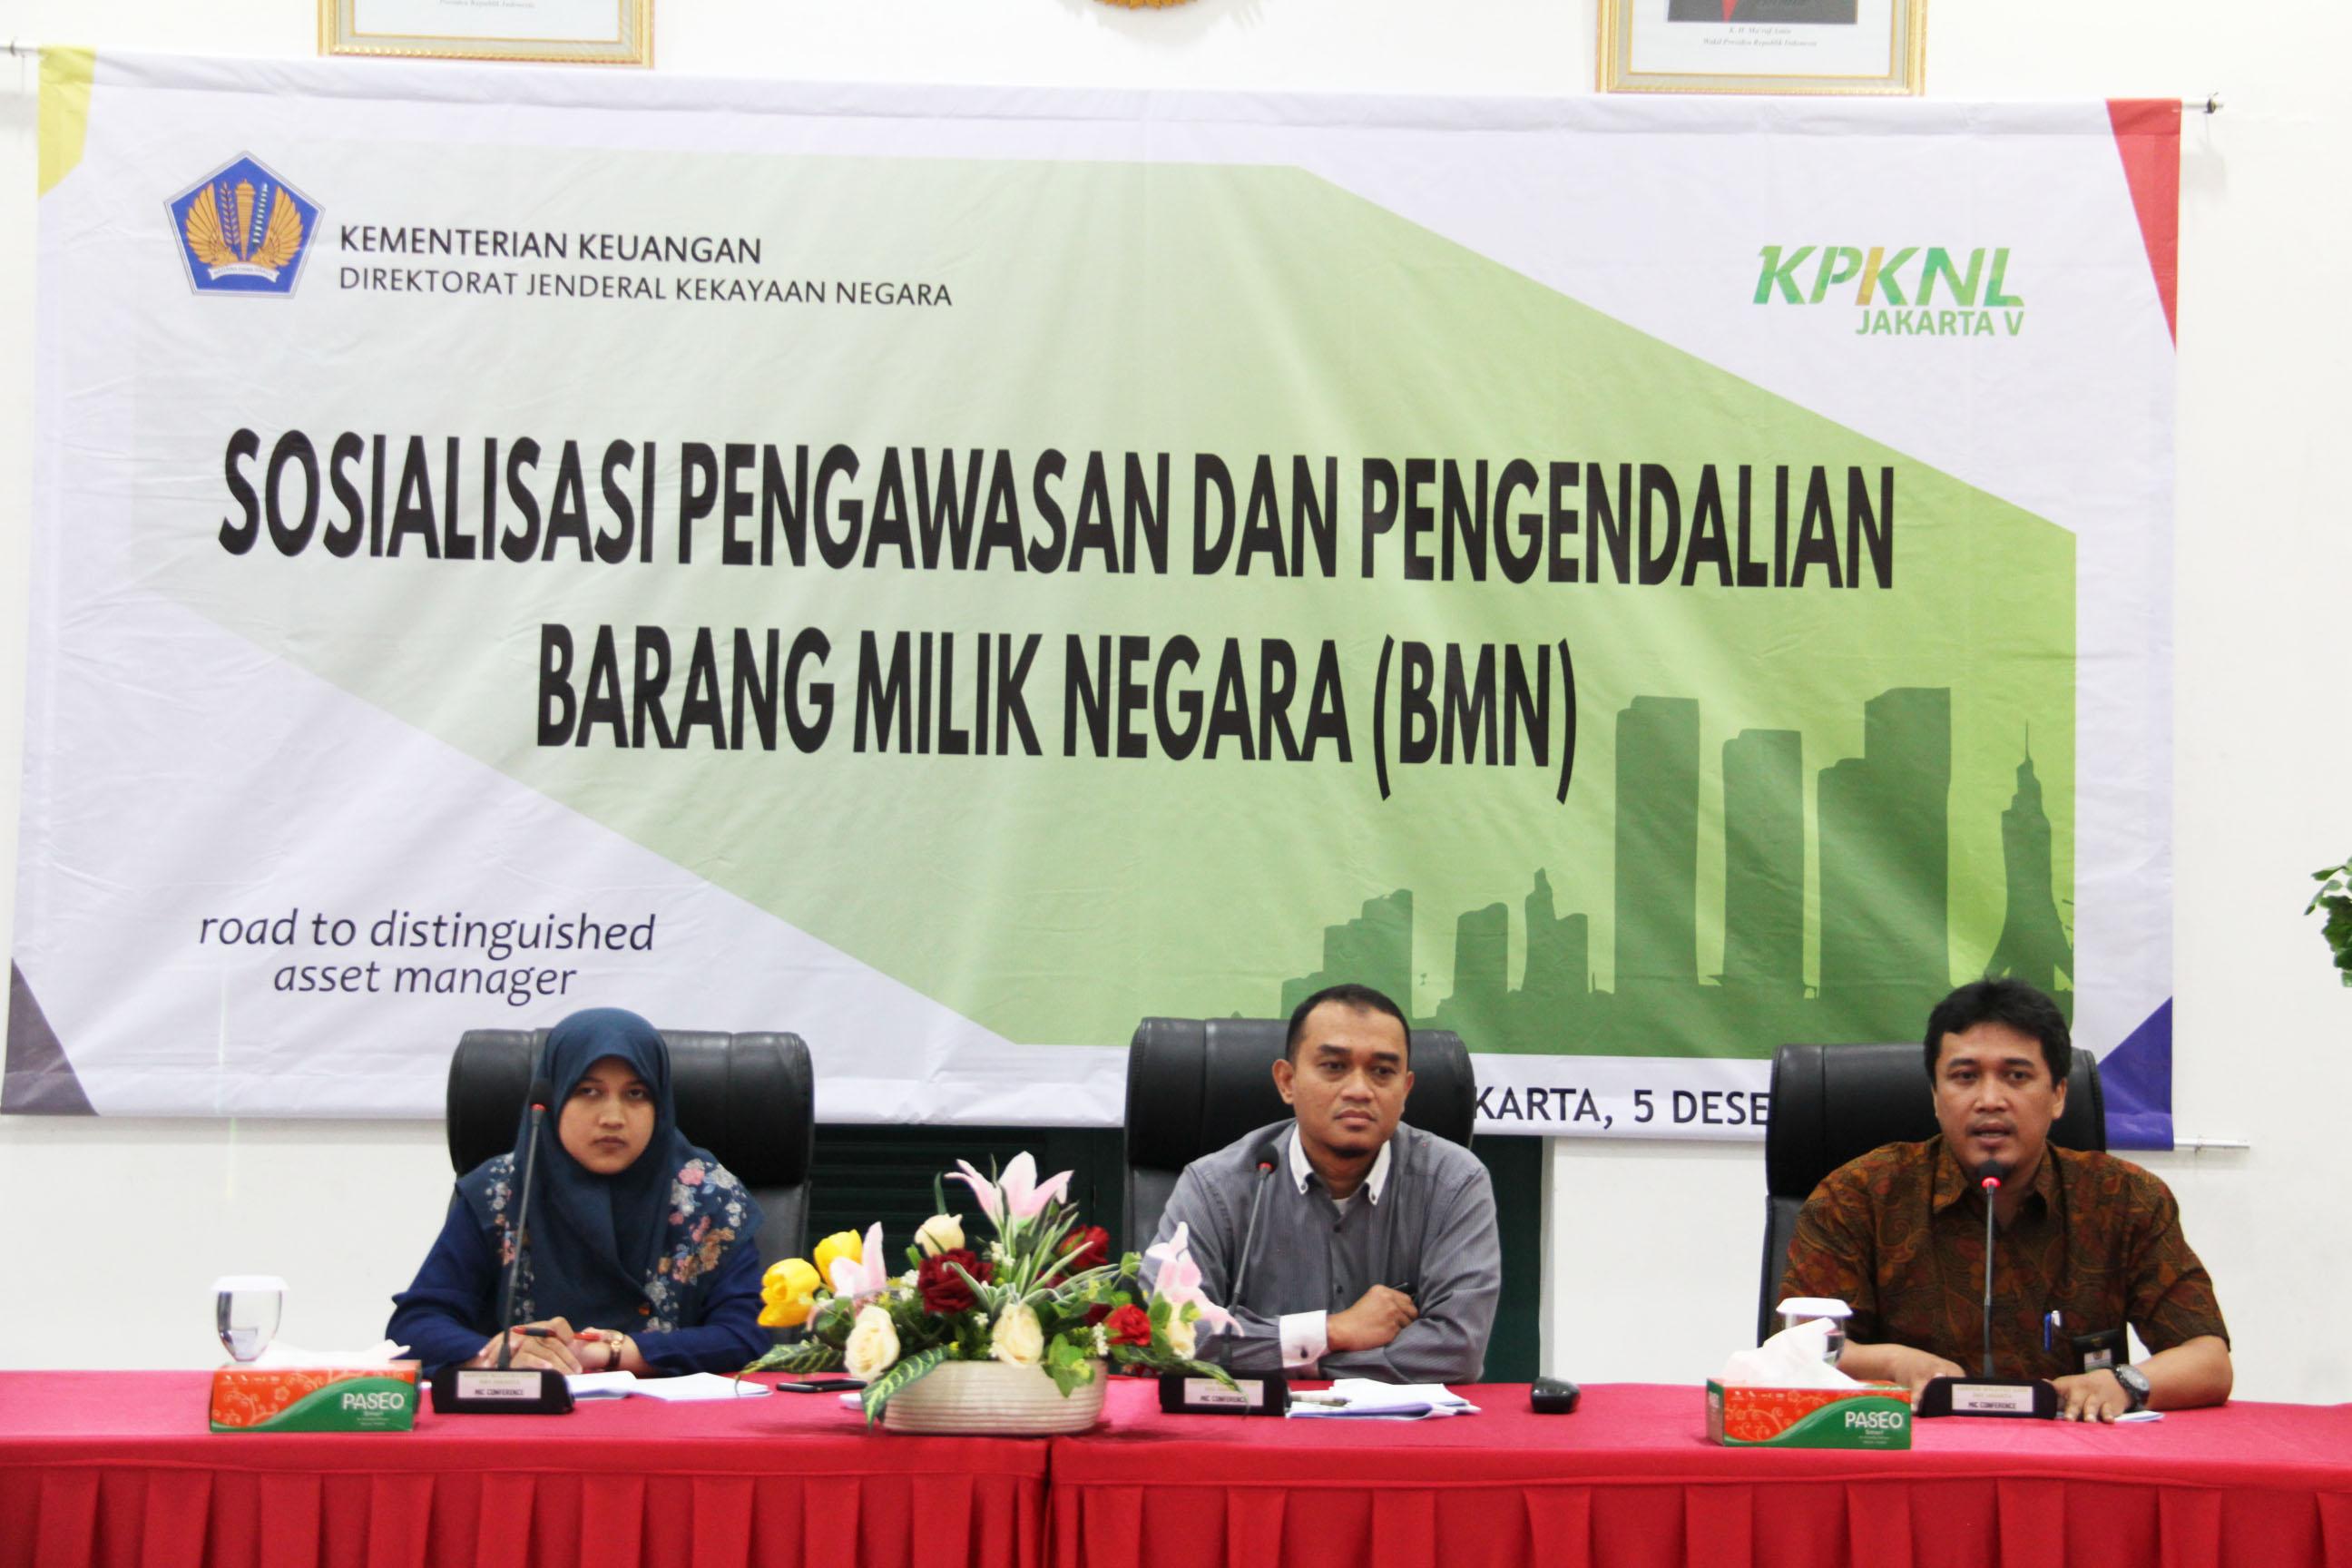 Tingkatkan Sinergi, KPKNL Jakarta V Gelar Sosialisasi Pengawasan dan Pengendalian BMN